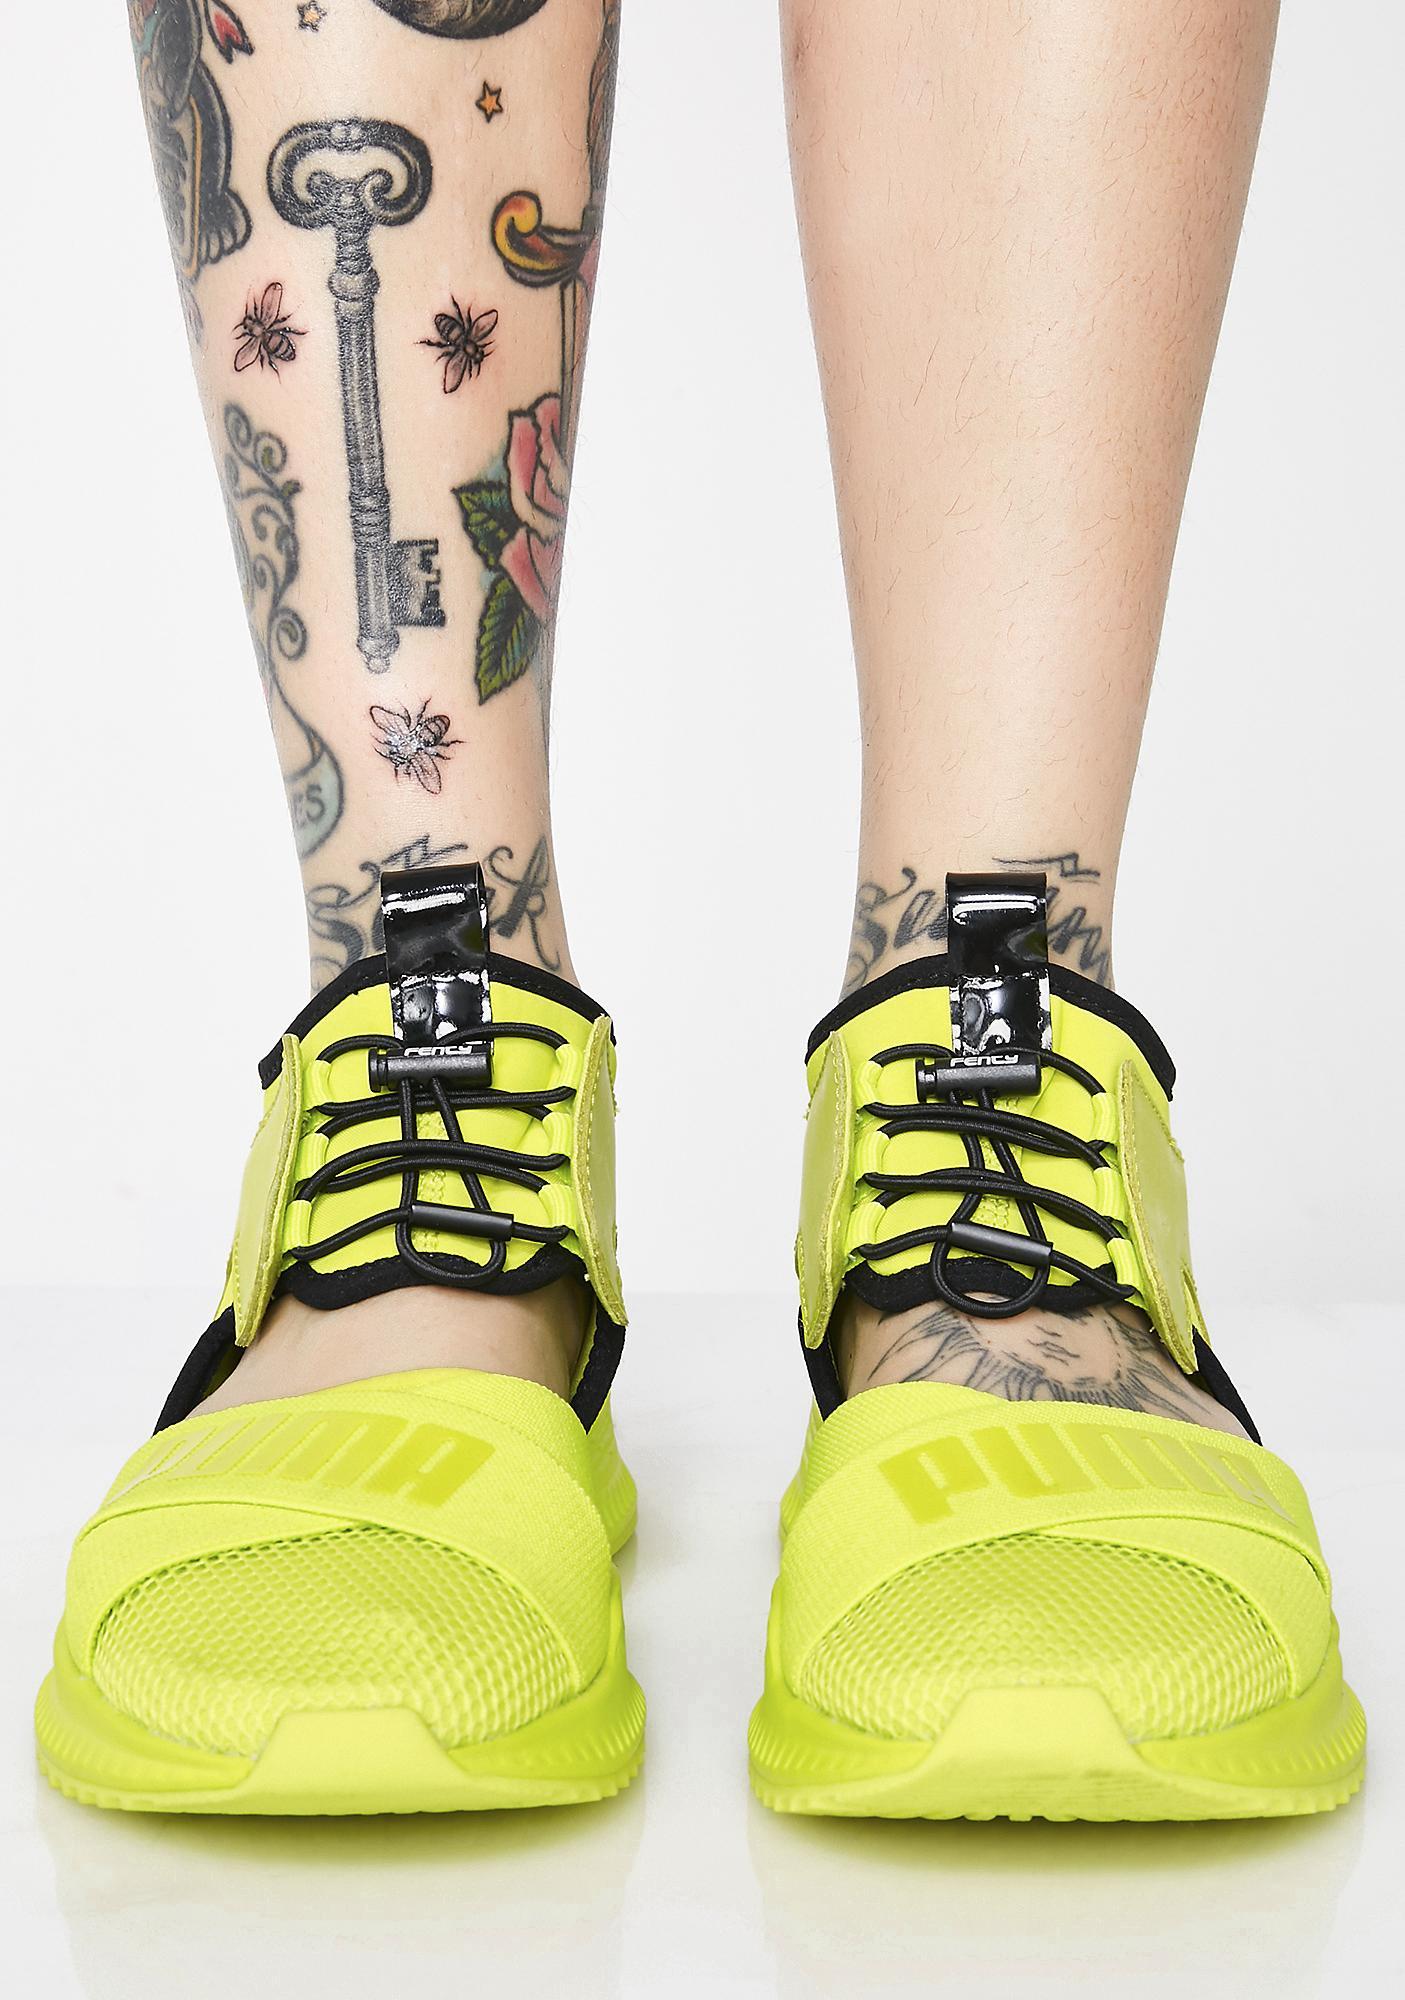 separation shoes b9f0a d432c FENTY PUMA By Rihanna Avid Sneakers